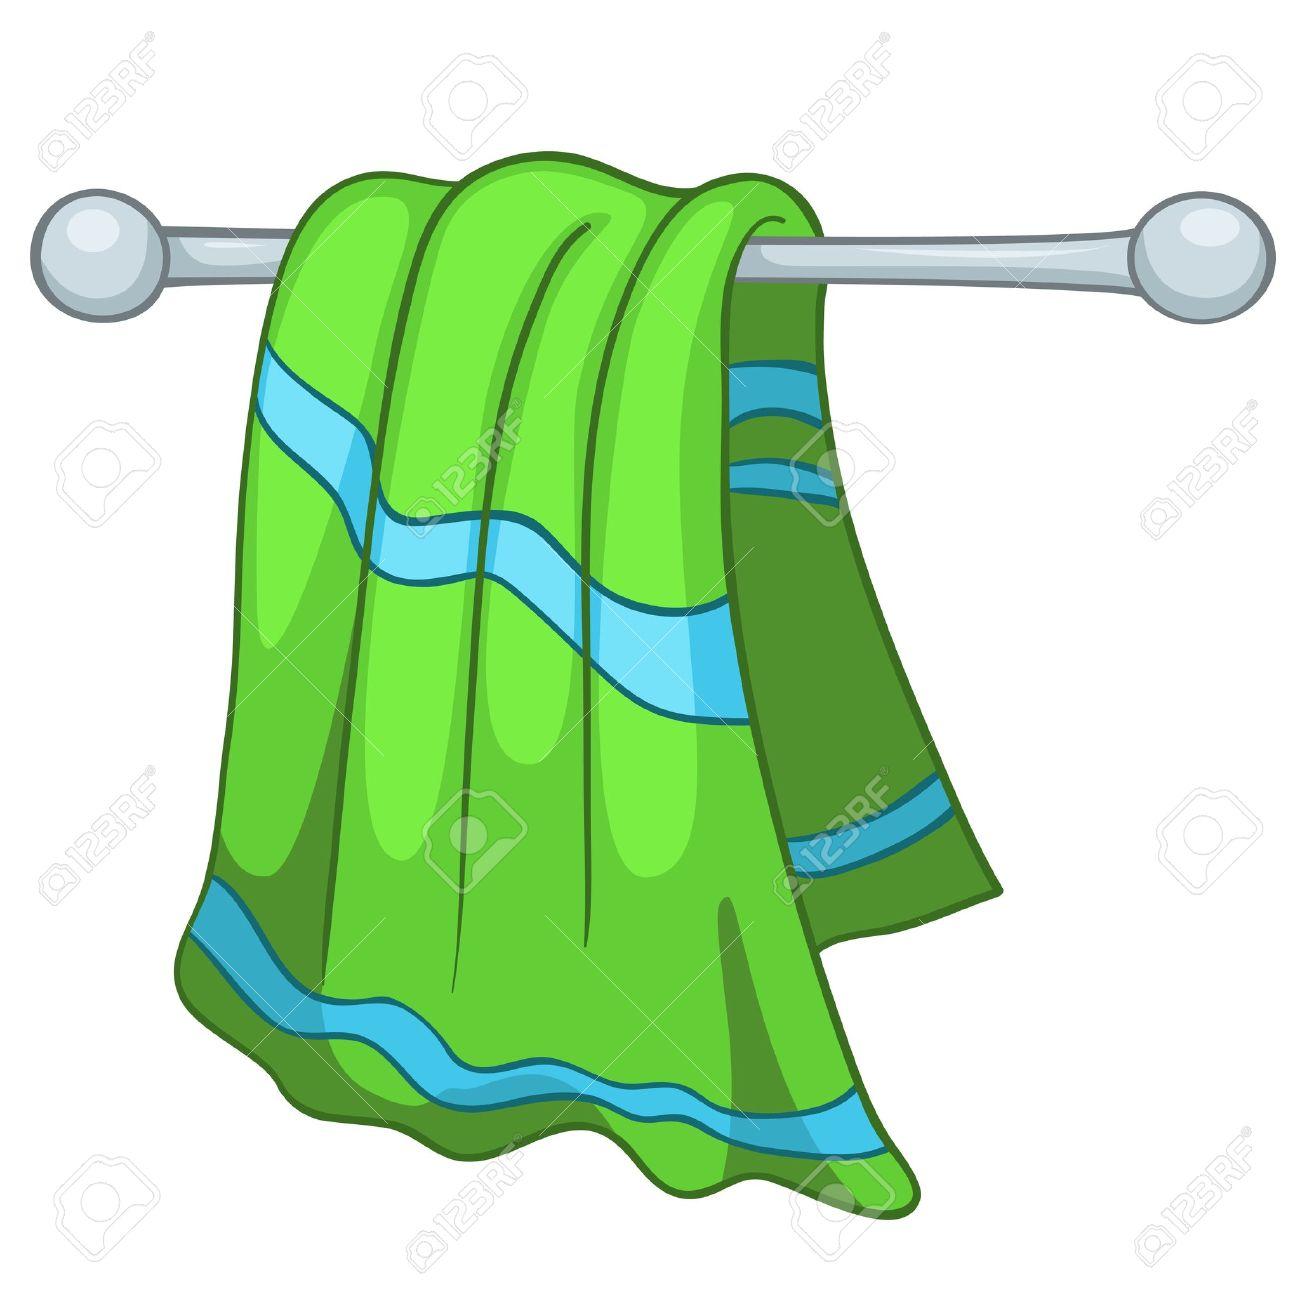 Kitchen Towel Hanging Towel Hanging Stock Photos Images Royalty Free Towel Hanging